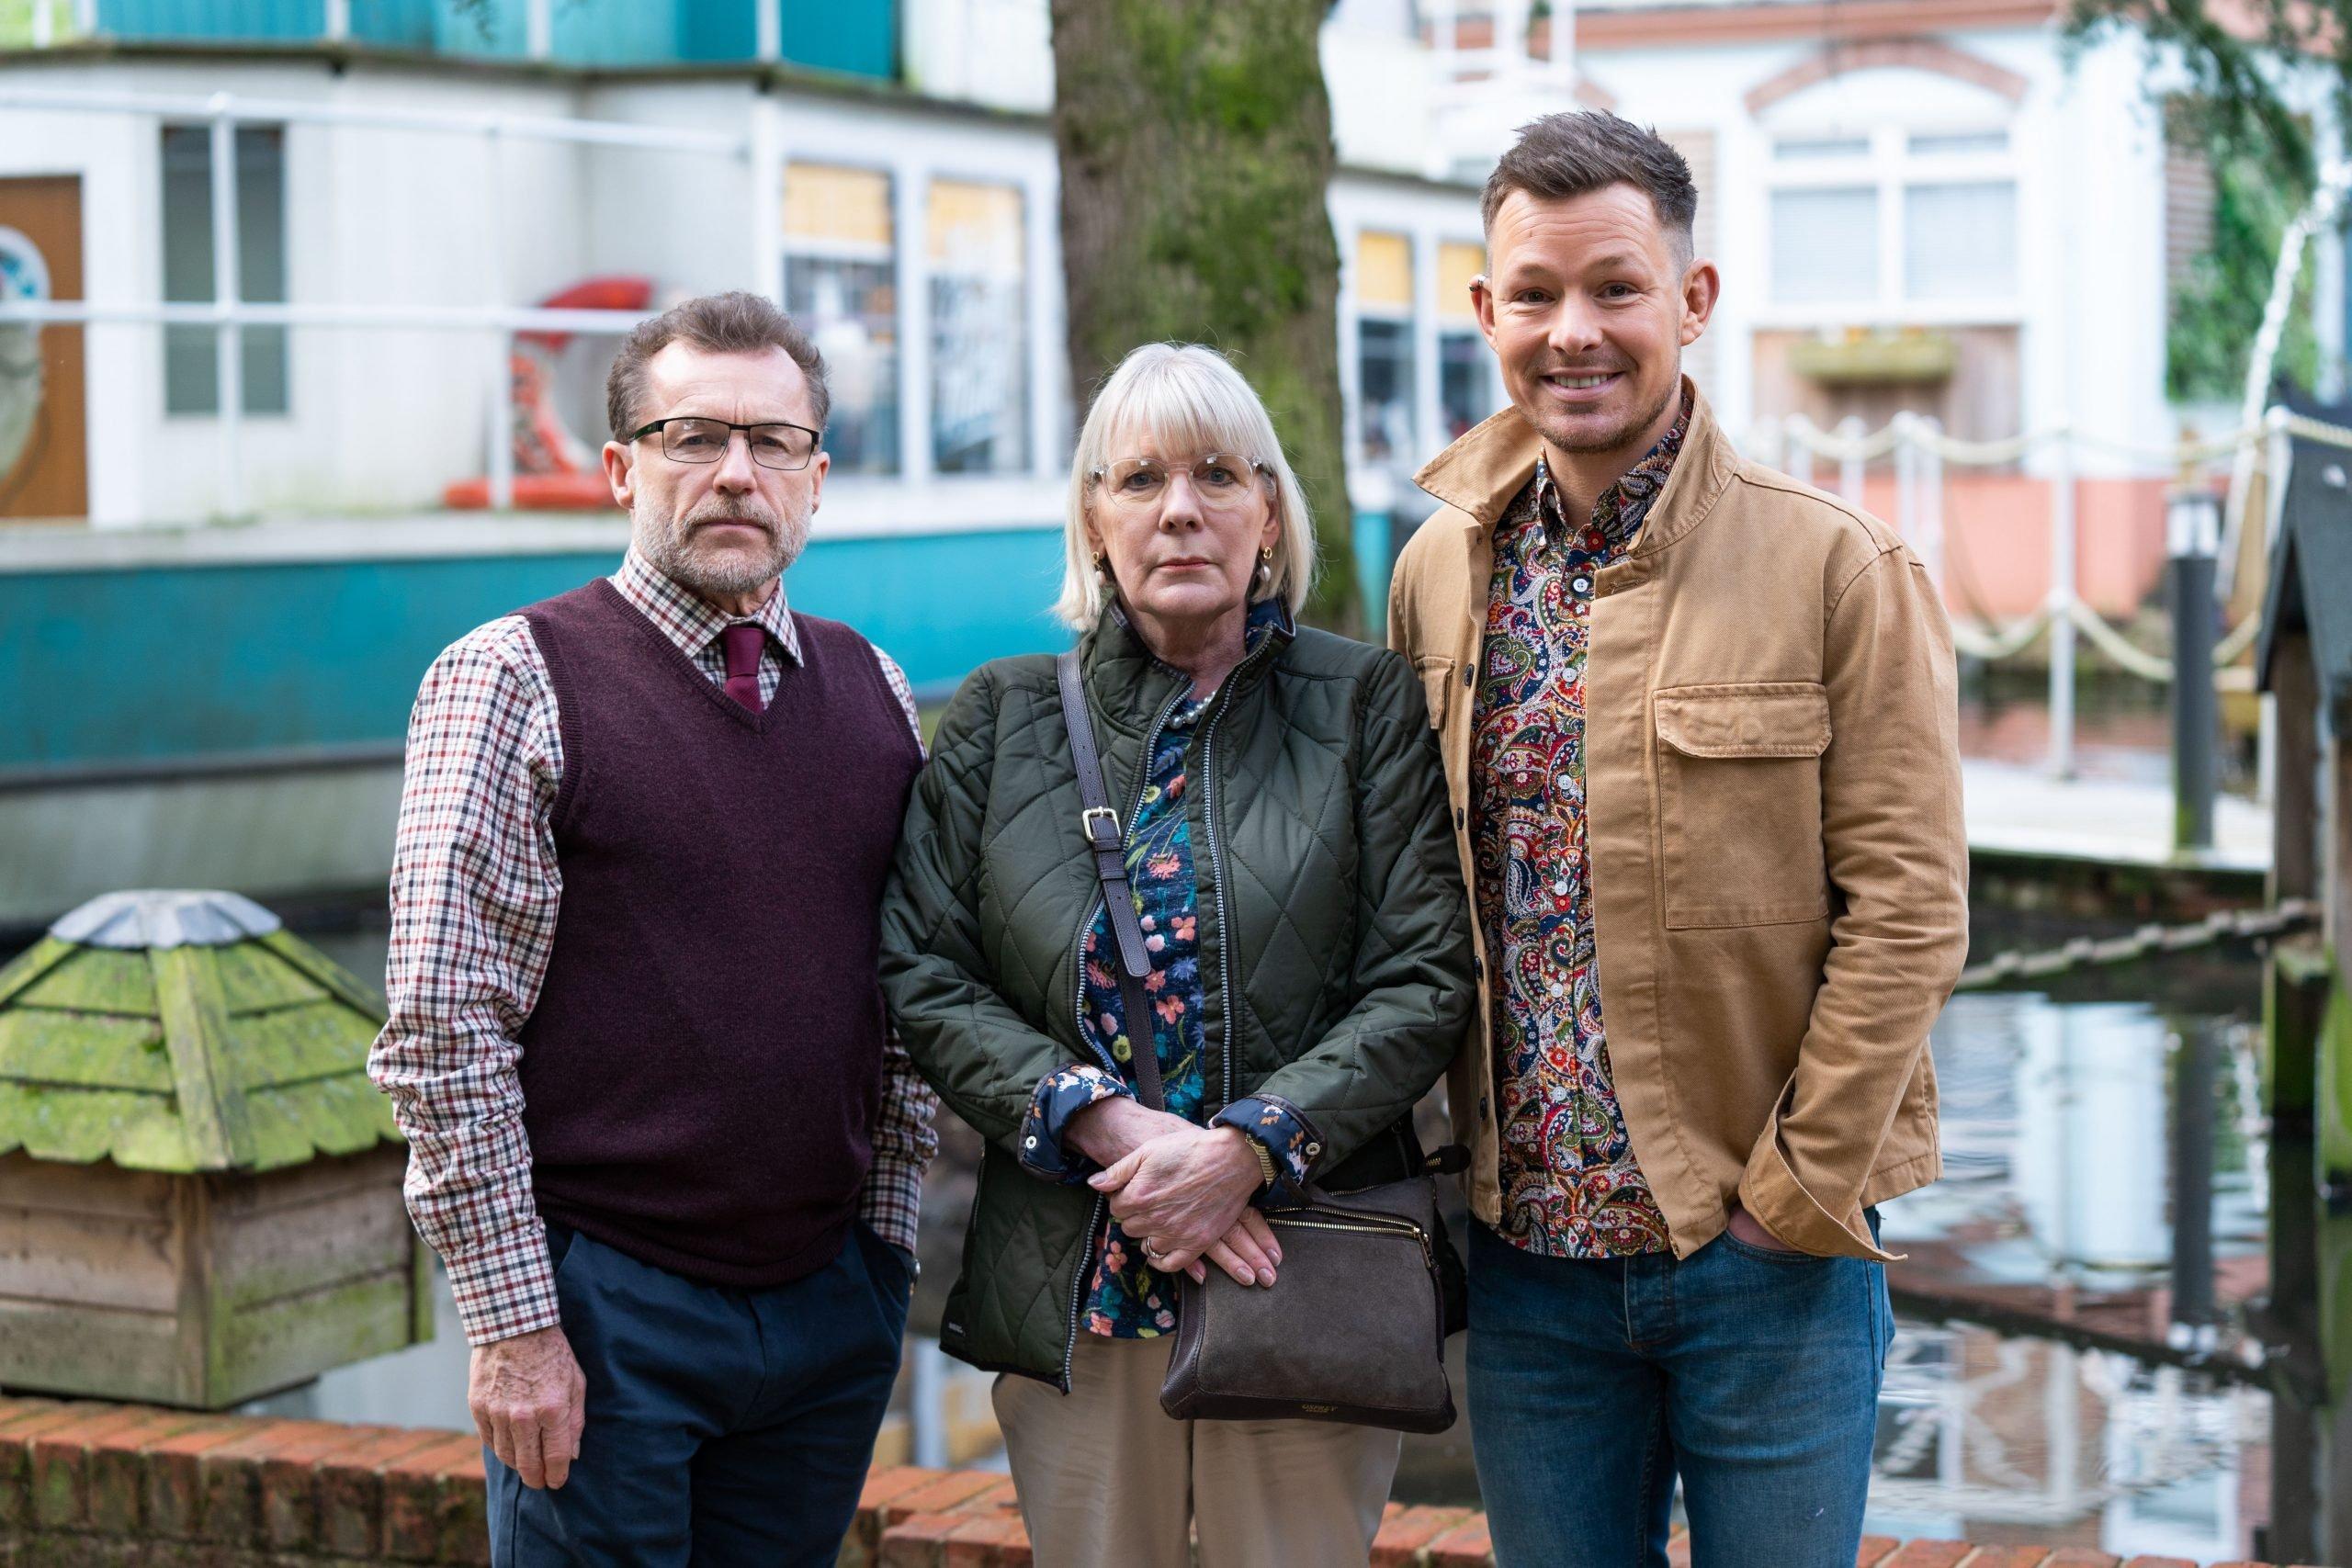 Former Coronation Street star Chris Quinten joins Hollyoaks